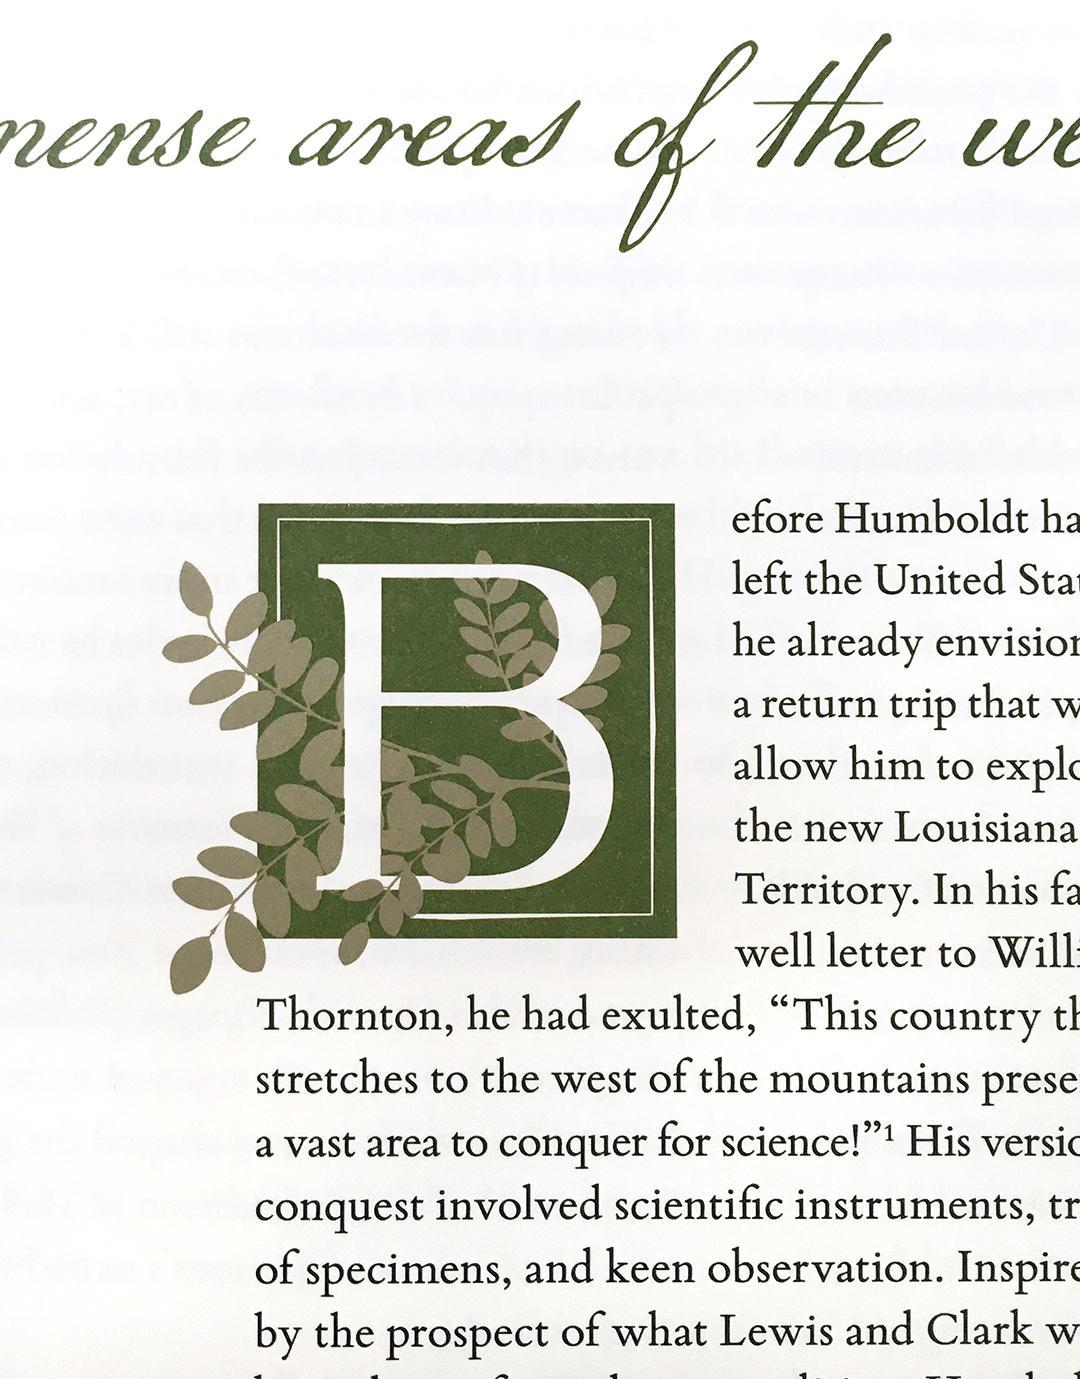 Slika unutar knjige s prvim slovom